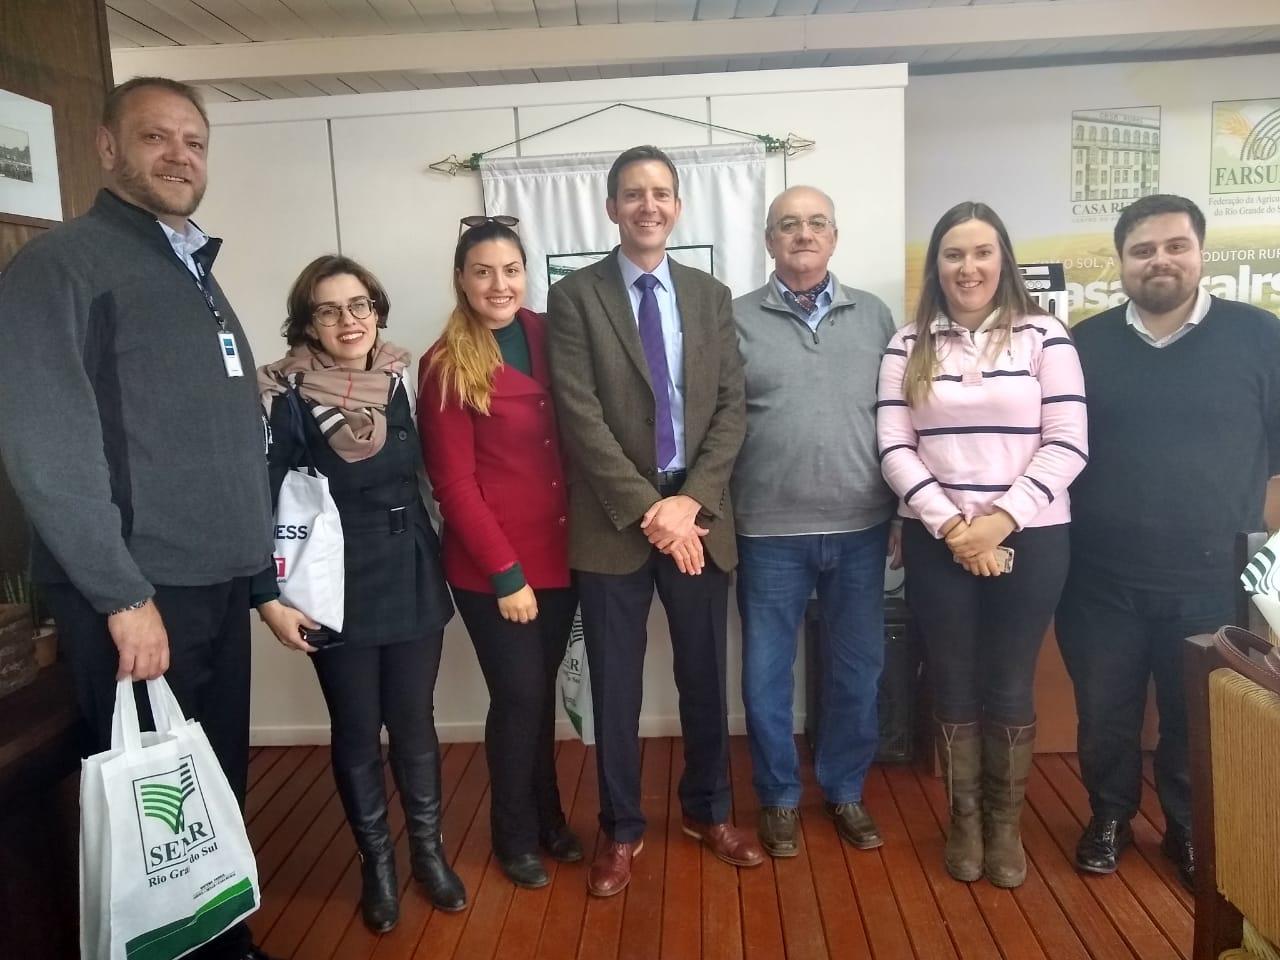 L-R Craig Stone (Traducza), Fernanda Silva, Juliana Alves (both DIT), Richard Saunders, Jose Avila (Farsul), Ruth Perry, Renan dos Santos (Farsul)